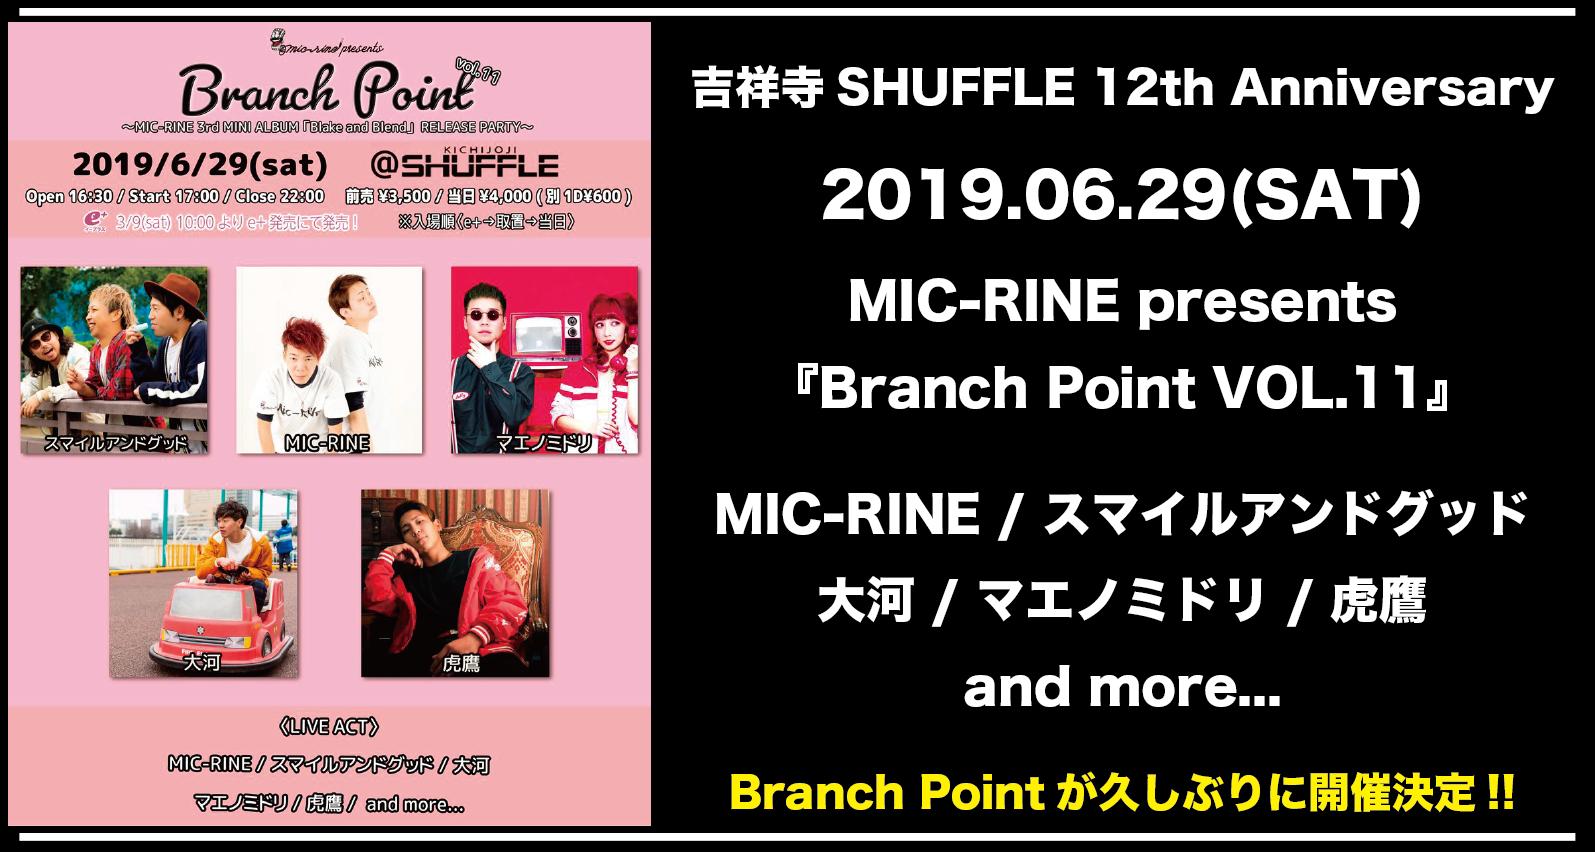 MIC-RINE presents 『Branch Point VOL.11』